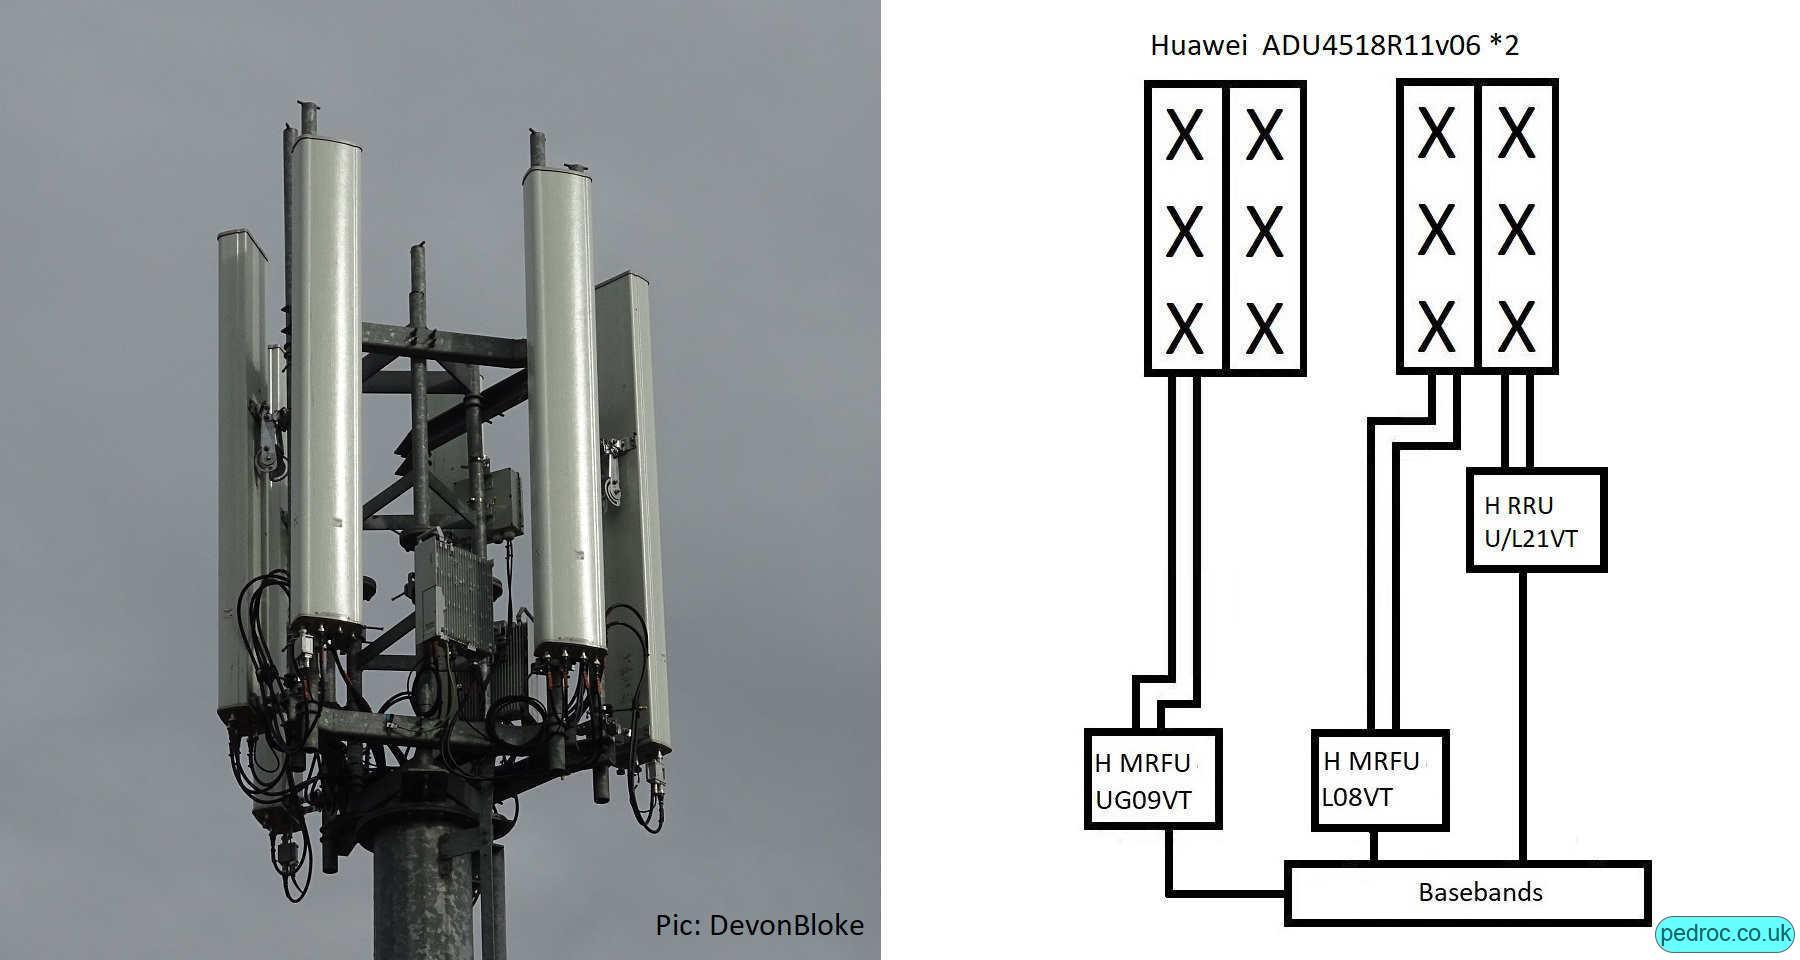 Vodafone Huawei medium-low site with Huawei ADU4518R11v06 antennas and RRUs.